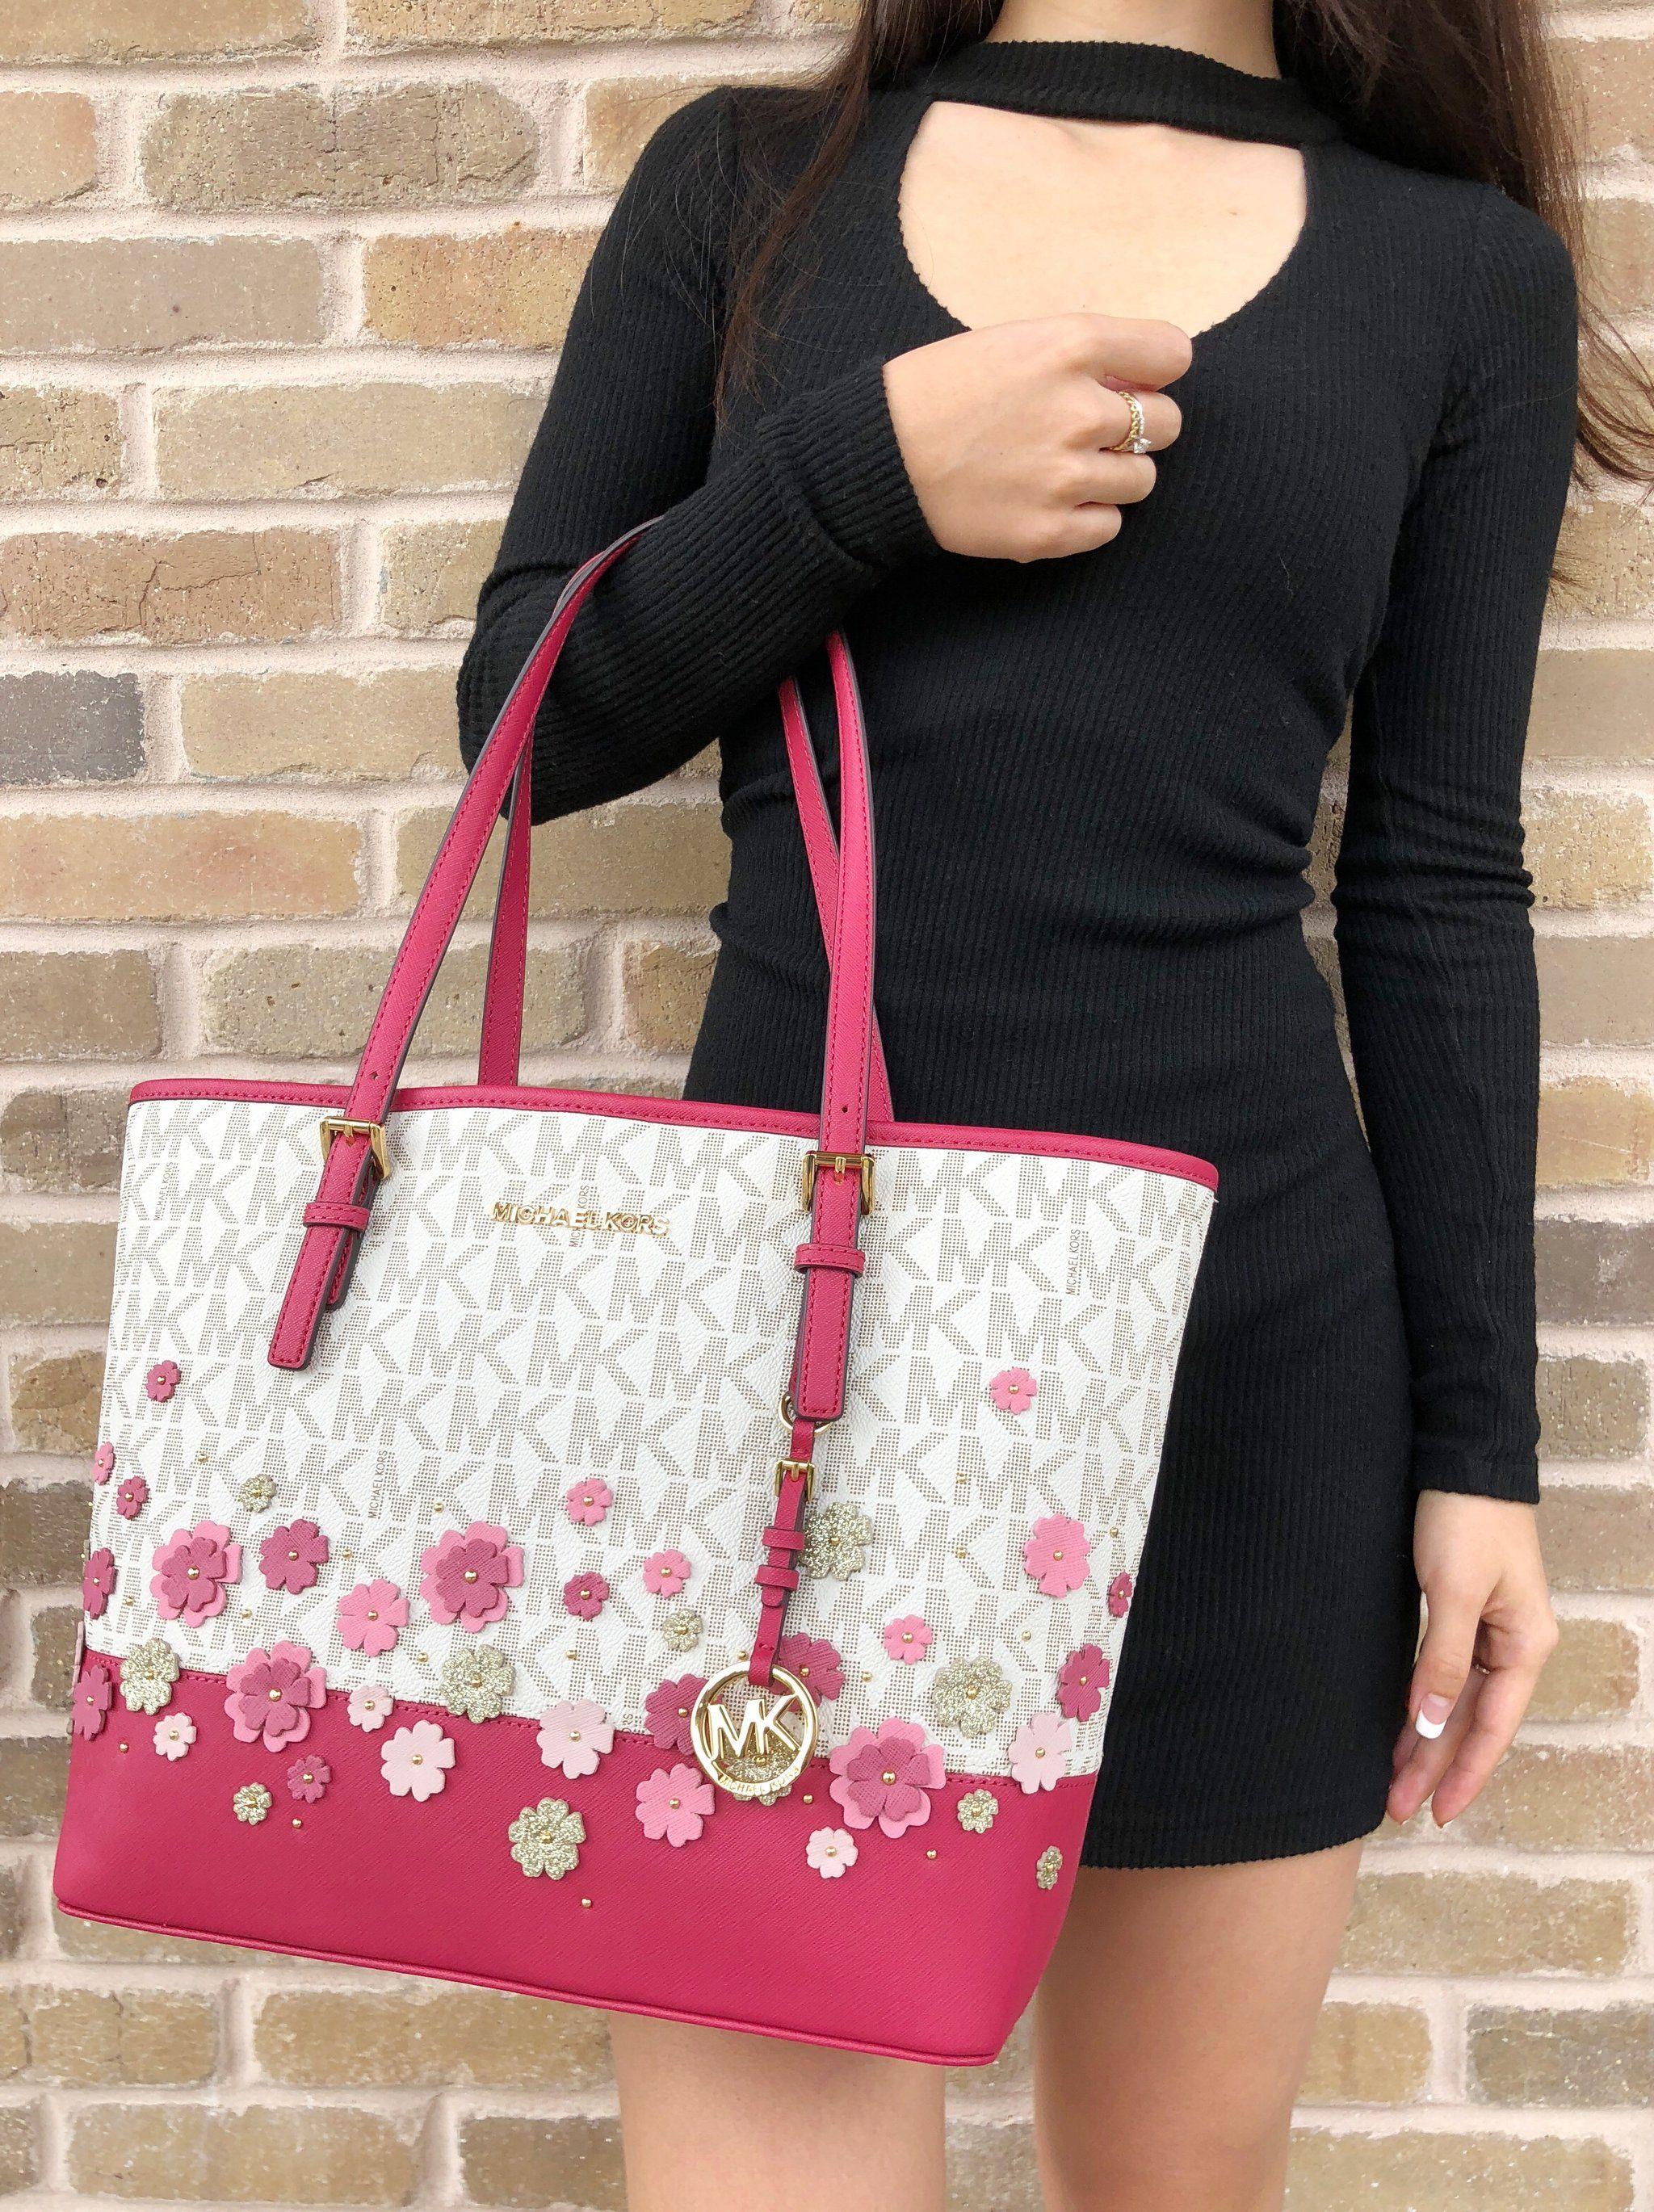 284fce74dd59c7 Michael Kors Medium Carryall Tote Pink Vanilla MK Floral Glitter ...